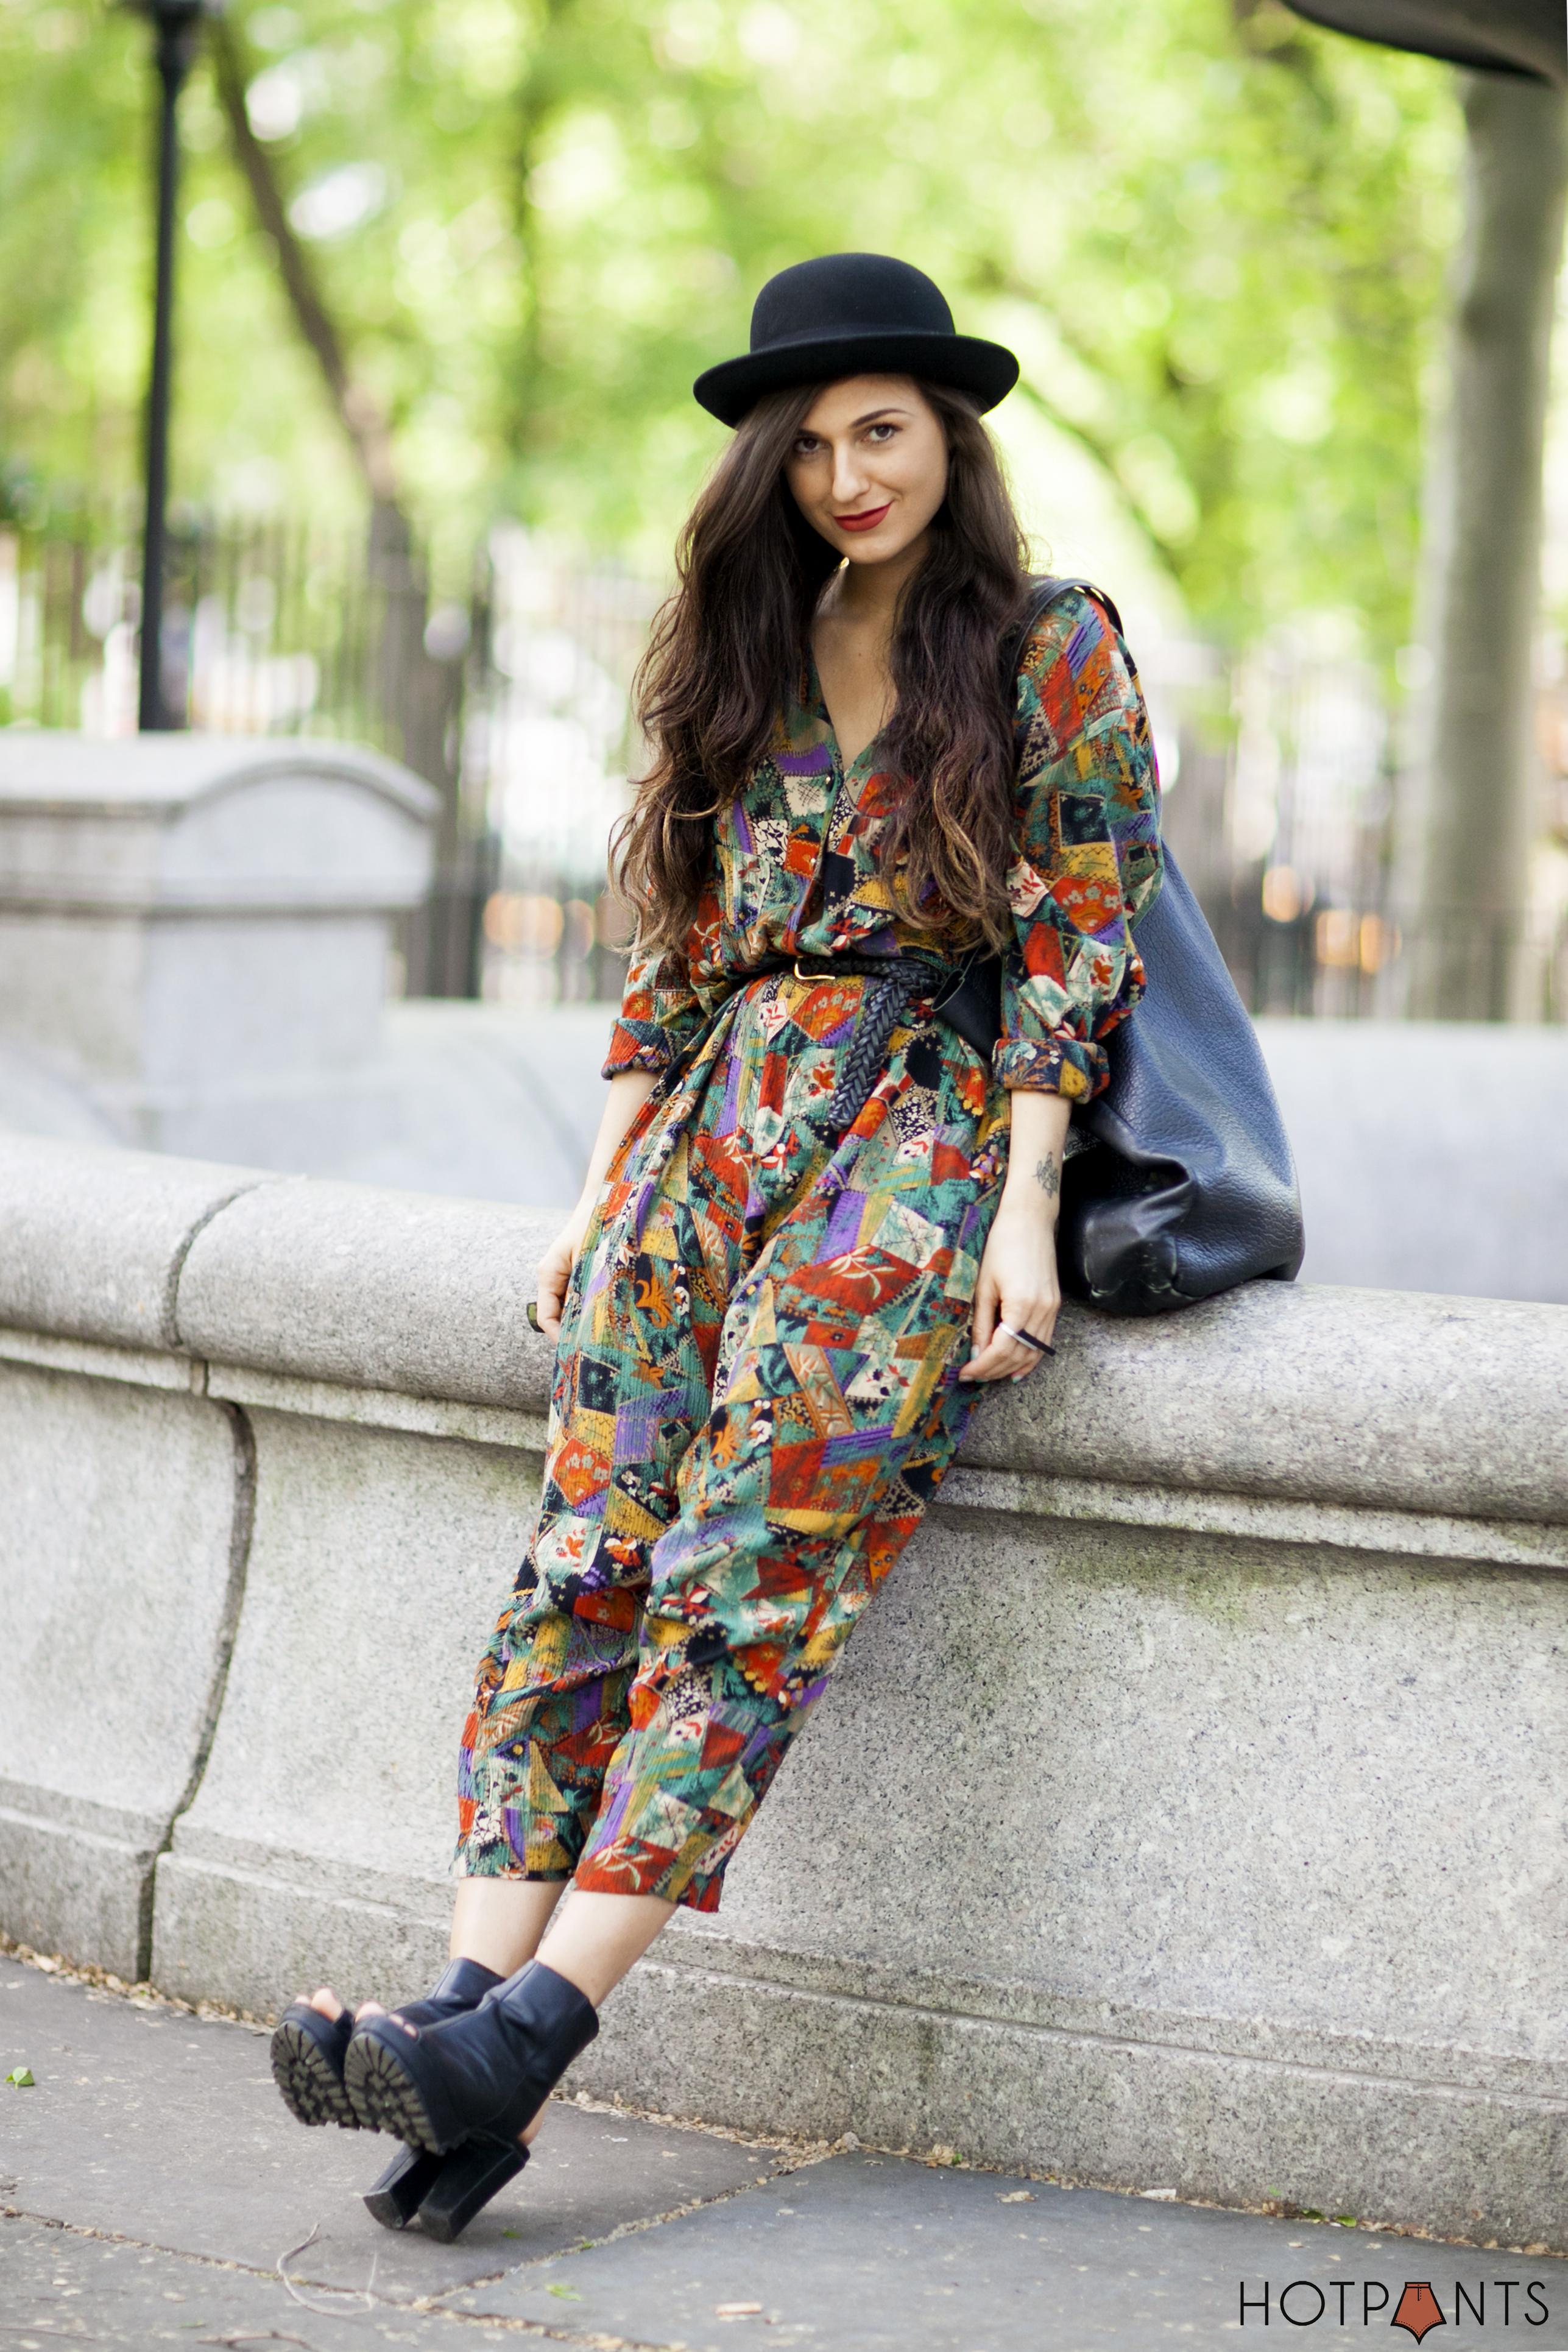 NYC New York Streetstyle Blogger Girl Long Hair